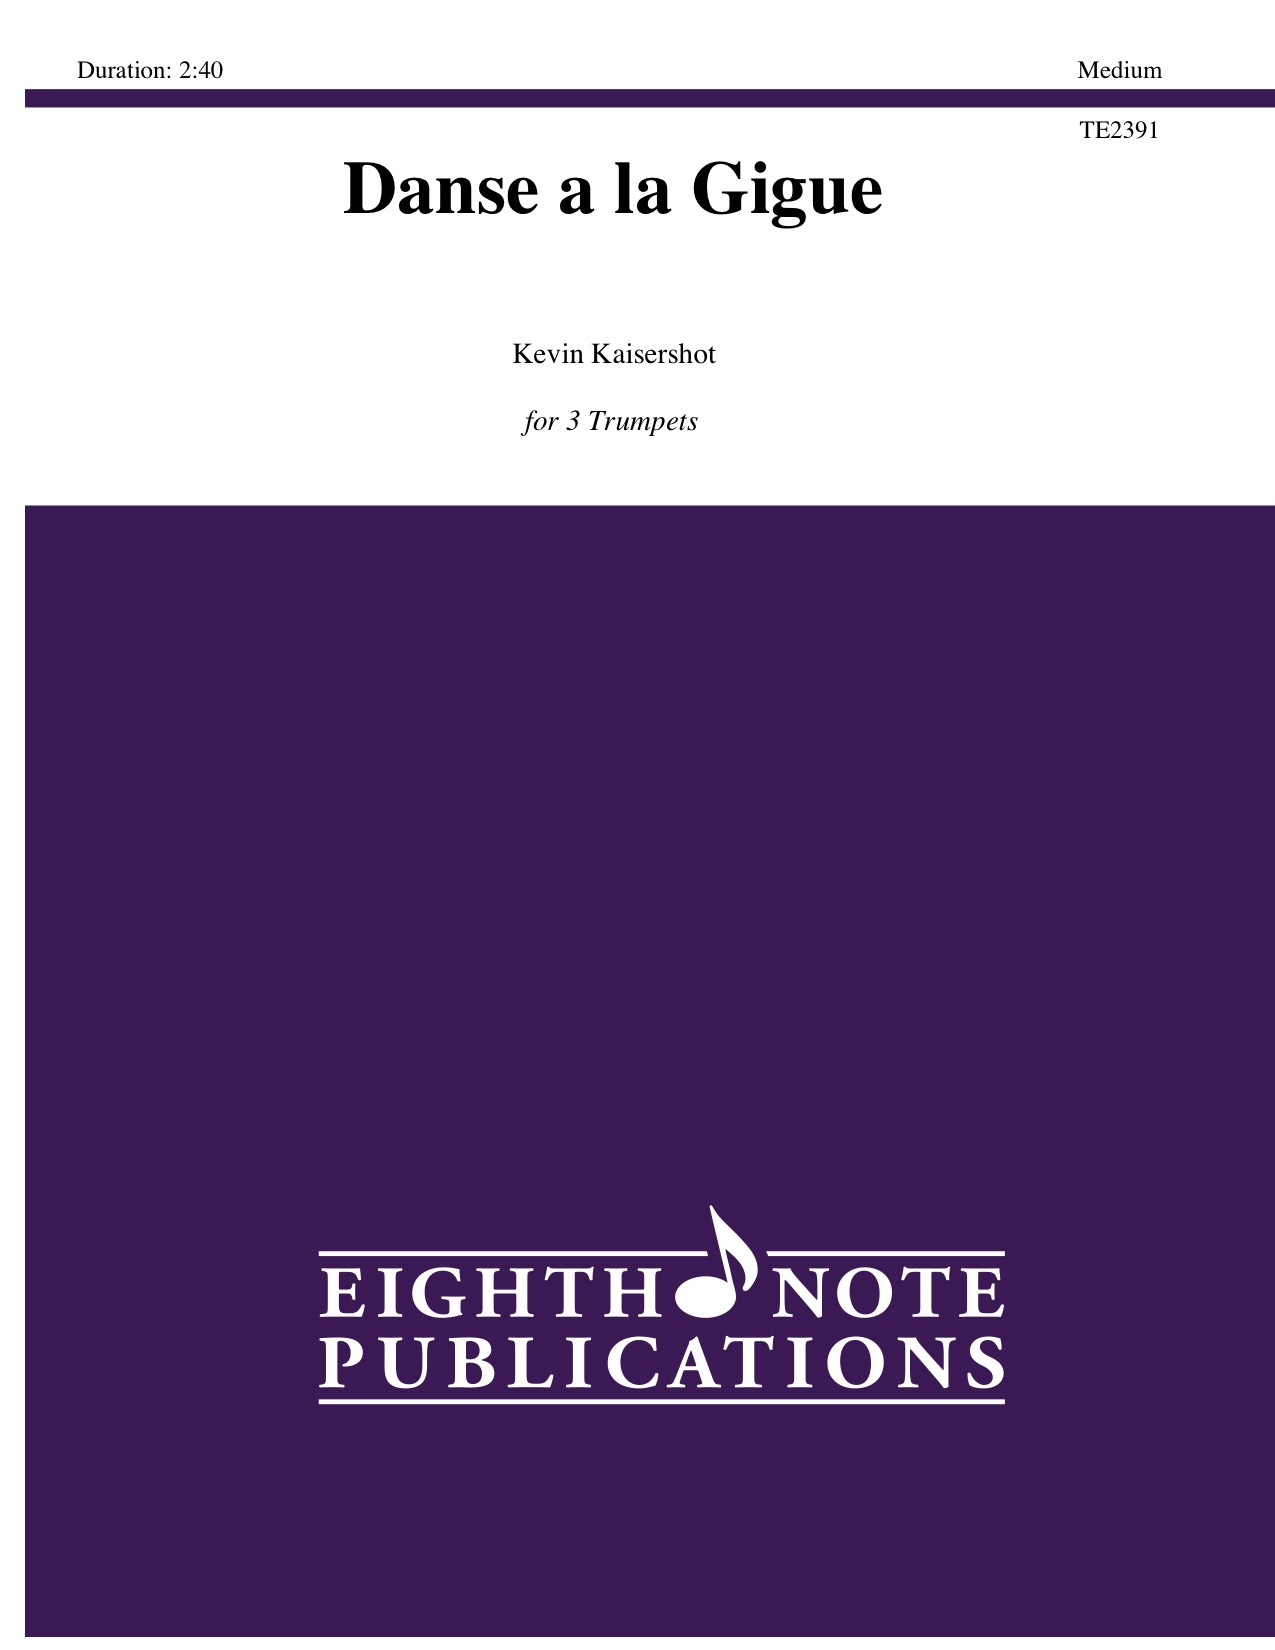 Danse a la Gigue  - Kevin Kaisershot